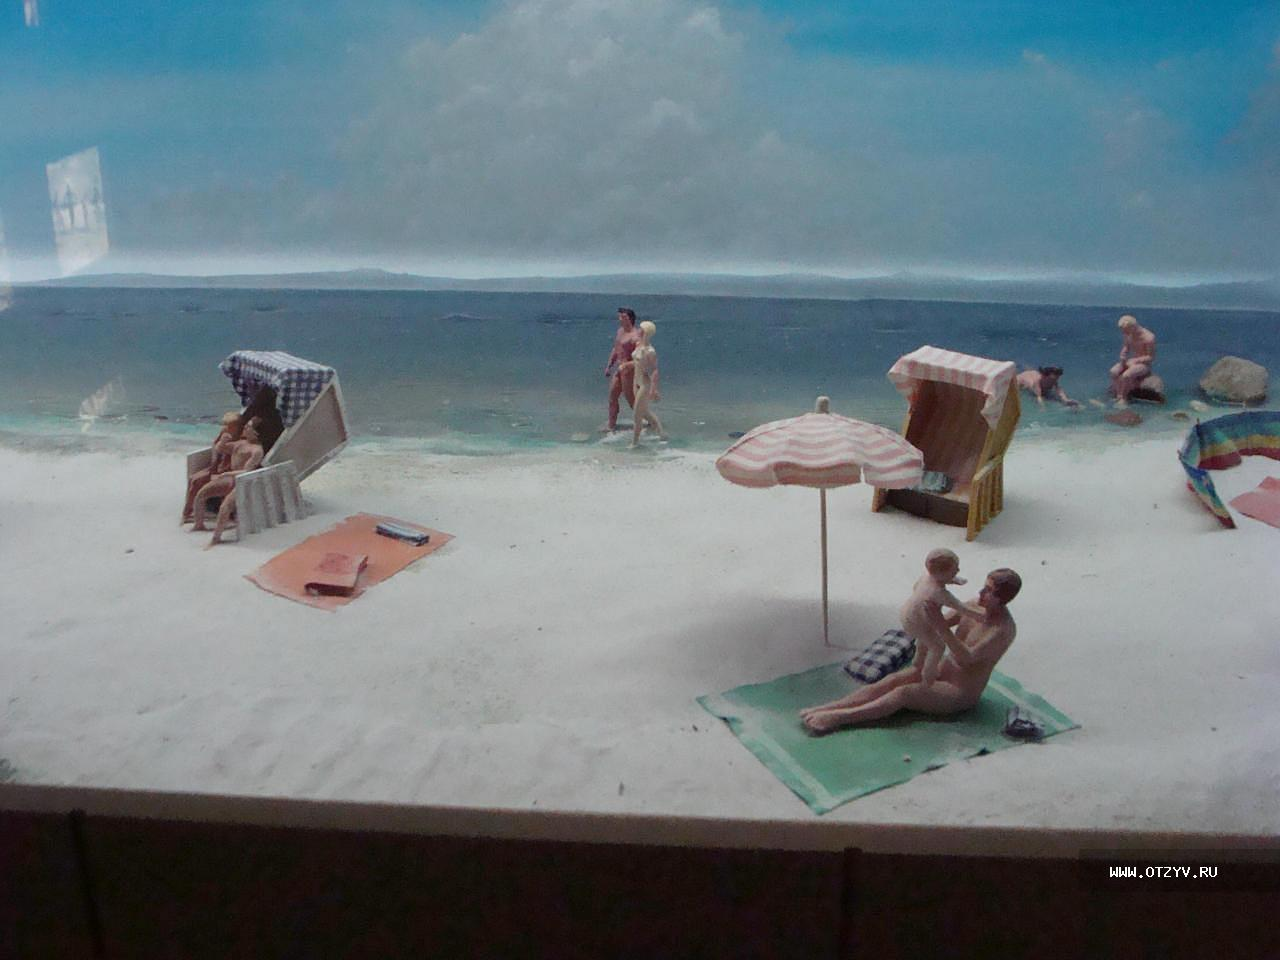 Нудист пляжи фрг